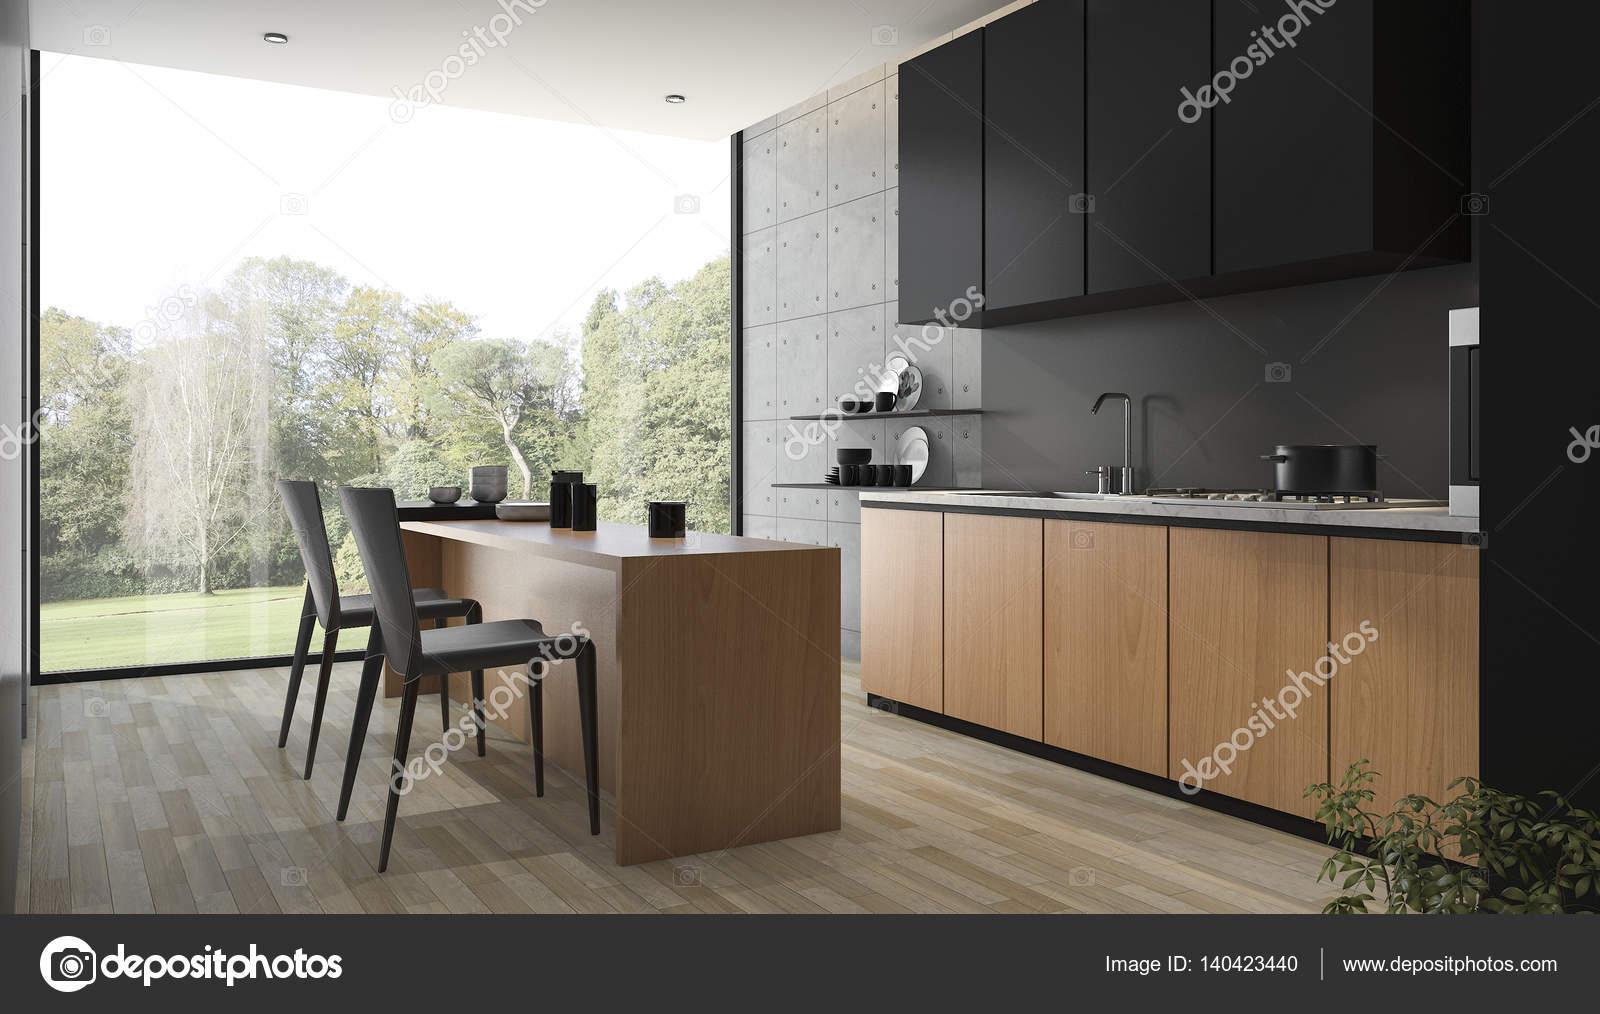 Moderne Zwarte Keuken : D rendering moderne zwarte keuken met gebouwd in hout u stockfoto